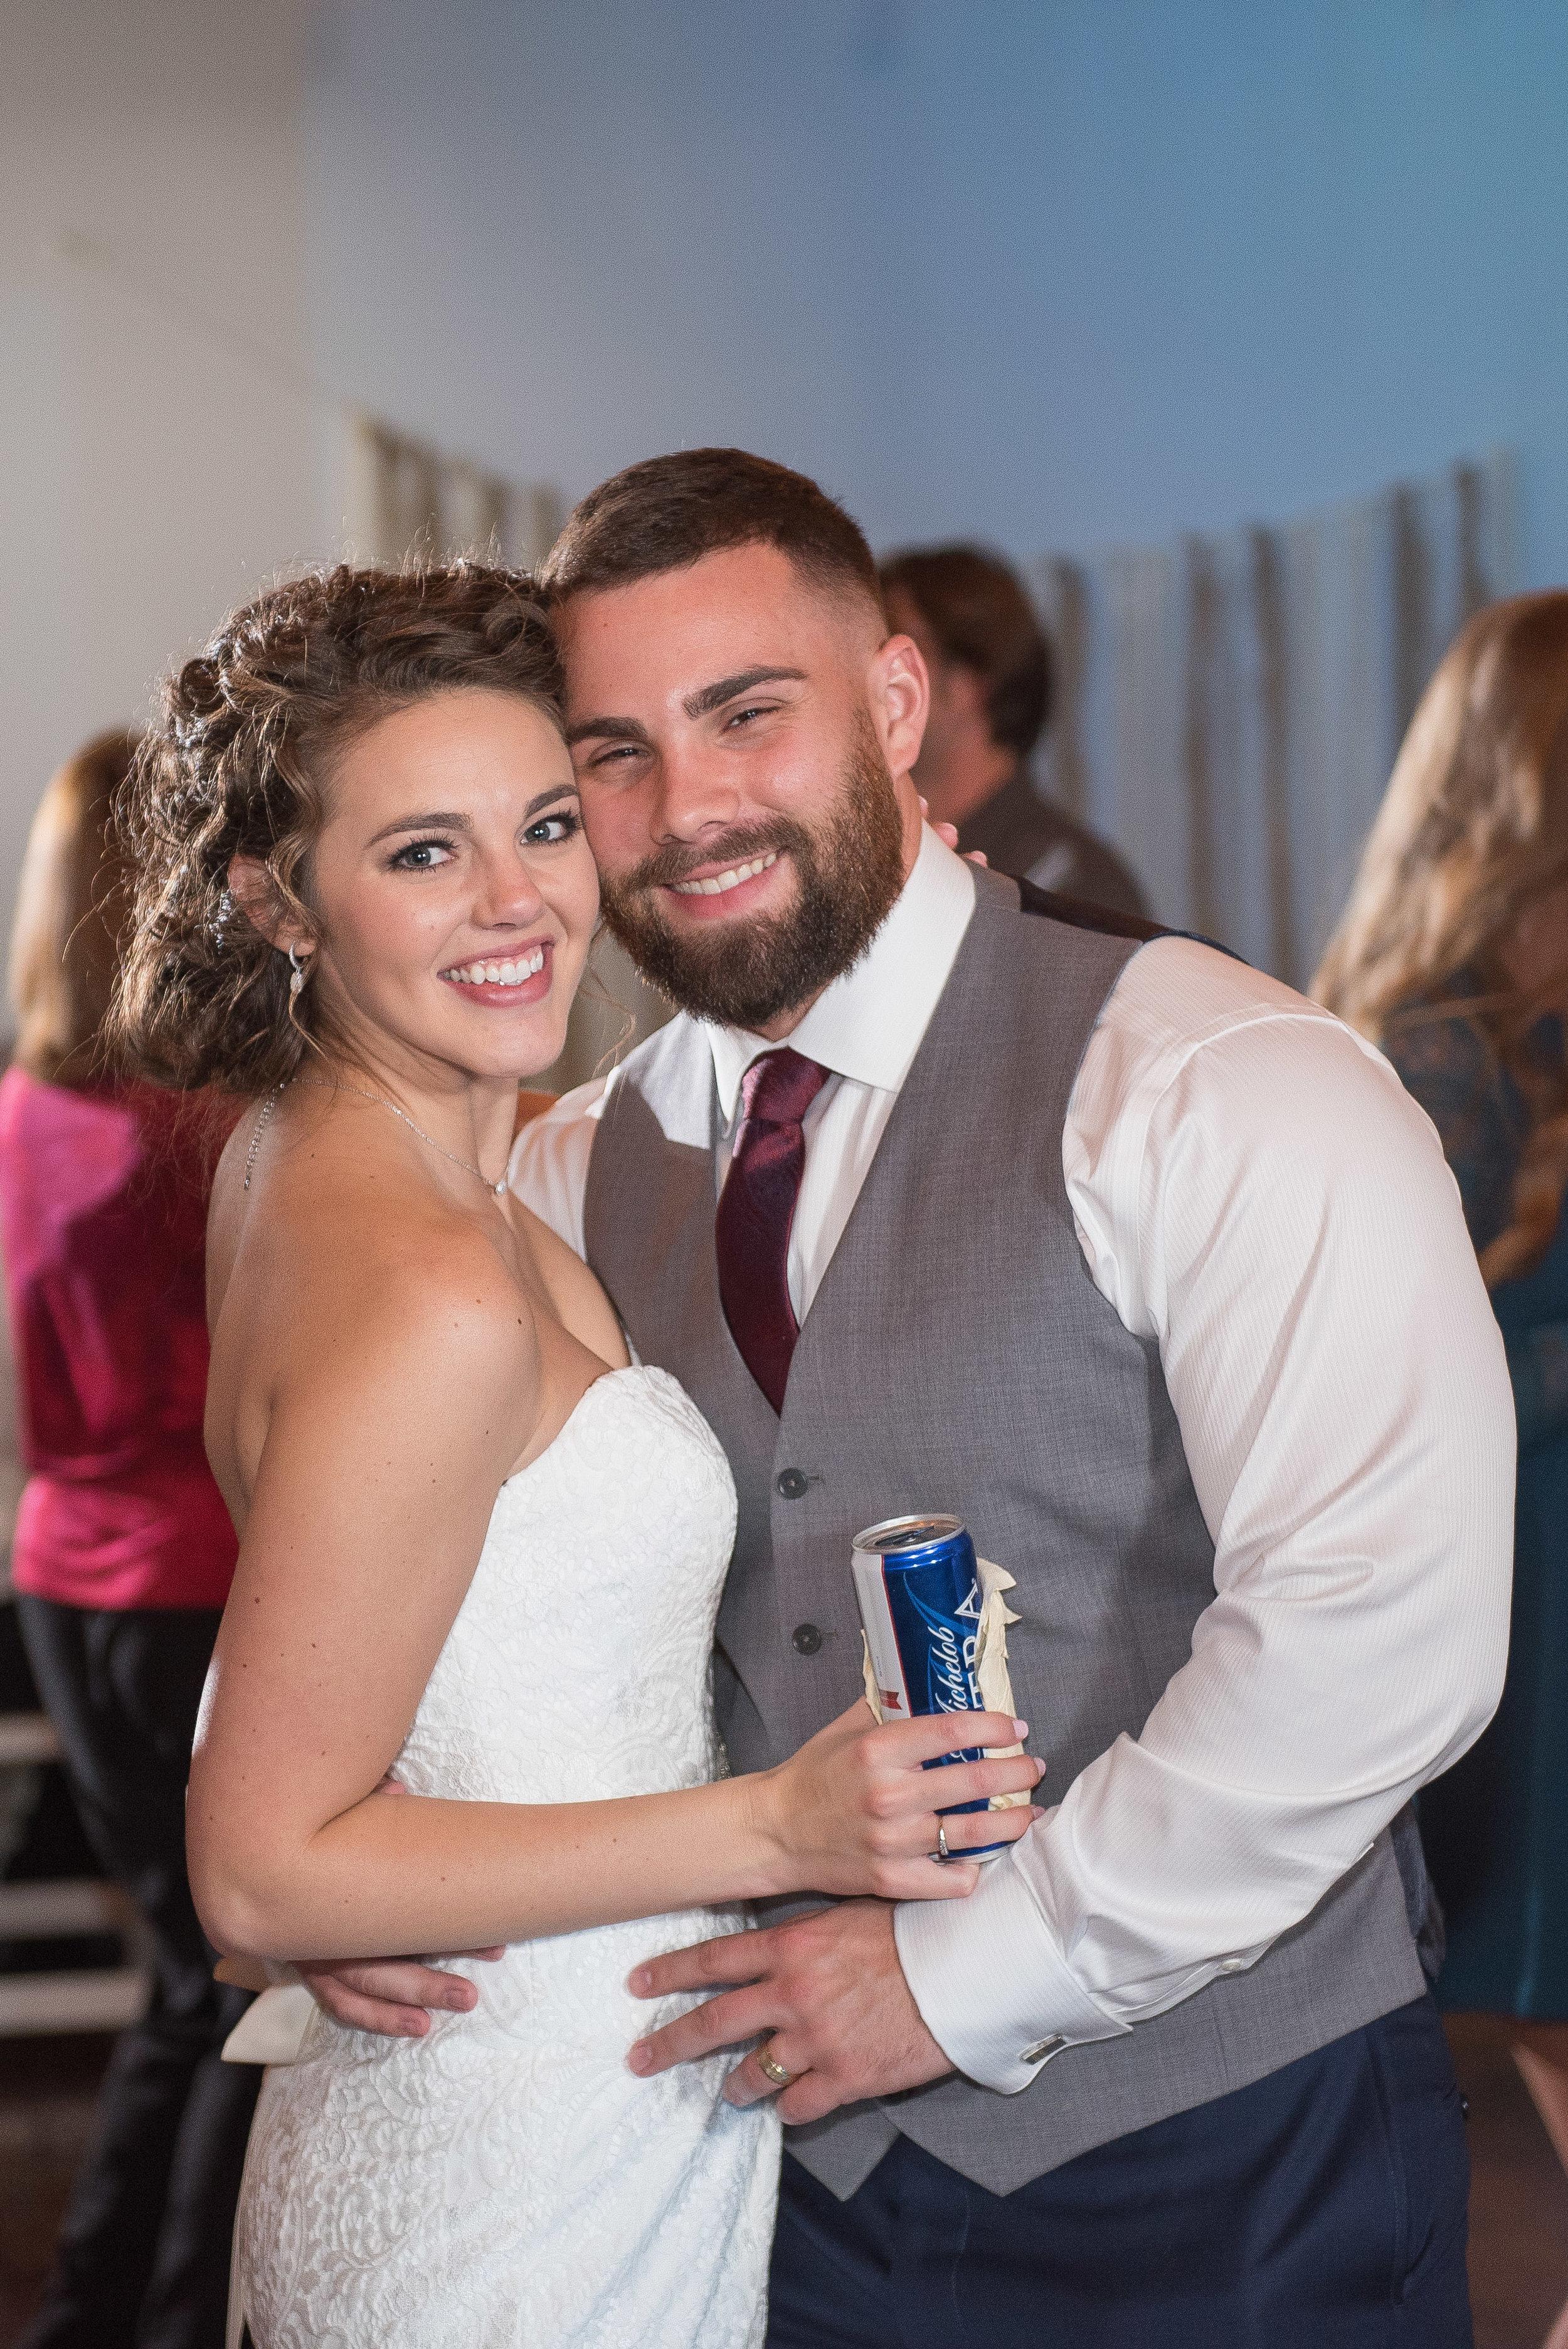 The Roller Mill Events - Winston Salem Weddings - NC Weddings - High Point NC Weddings - Winston Salem Venue - Yasmin Leonard Photography-81.jpg